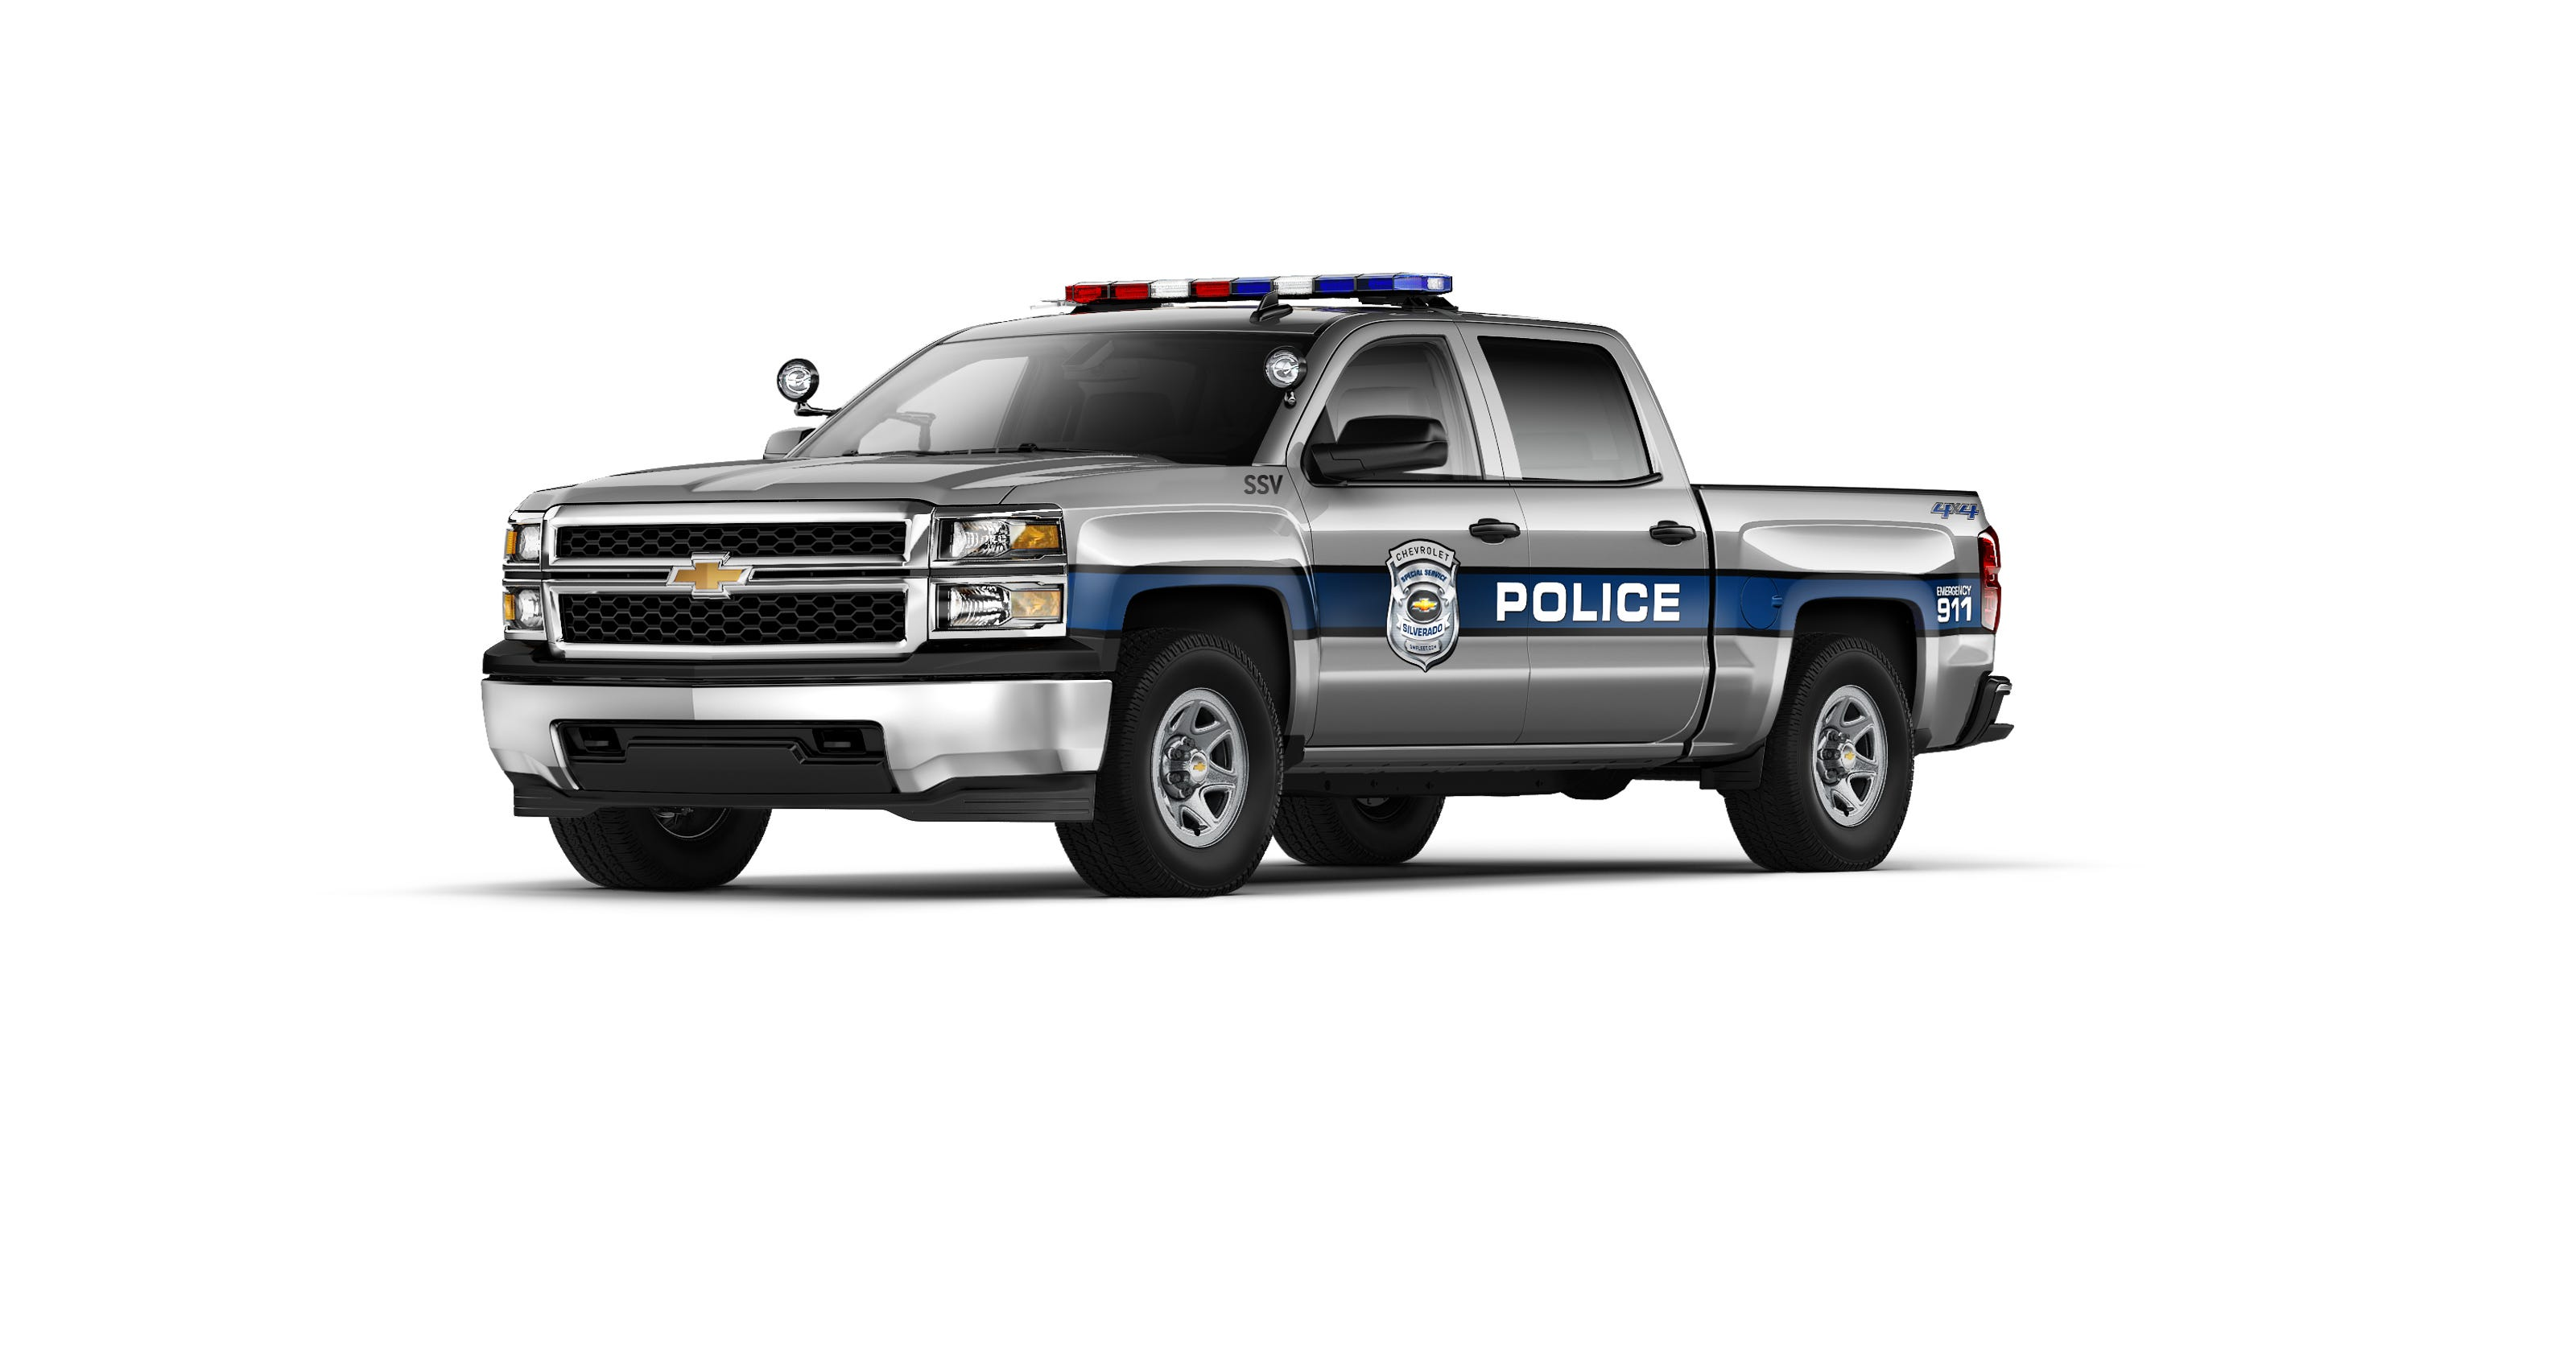 Chevy decks out first Silverado police truck